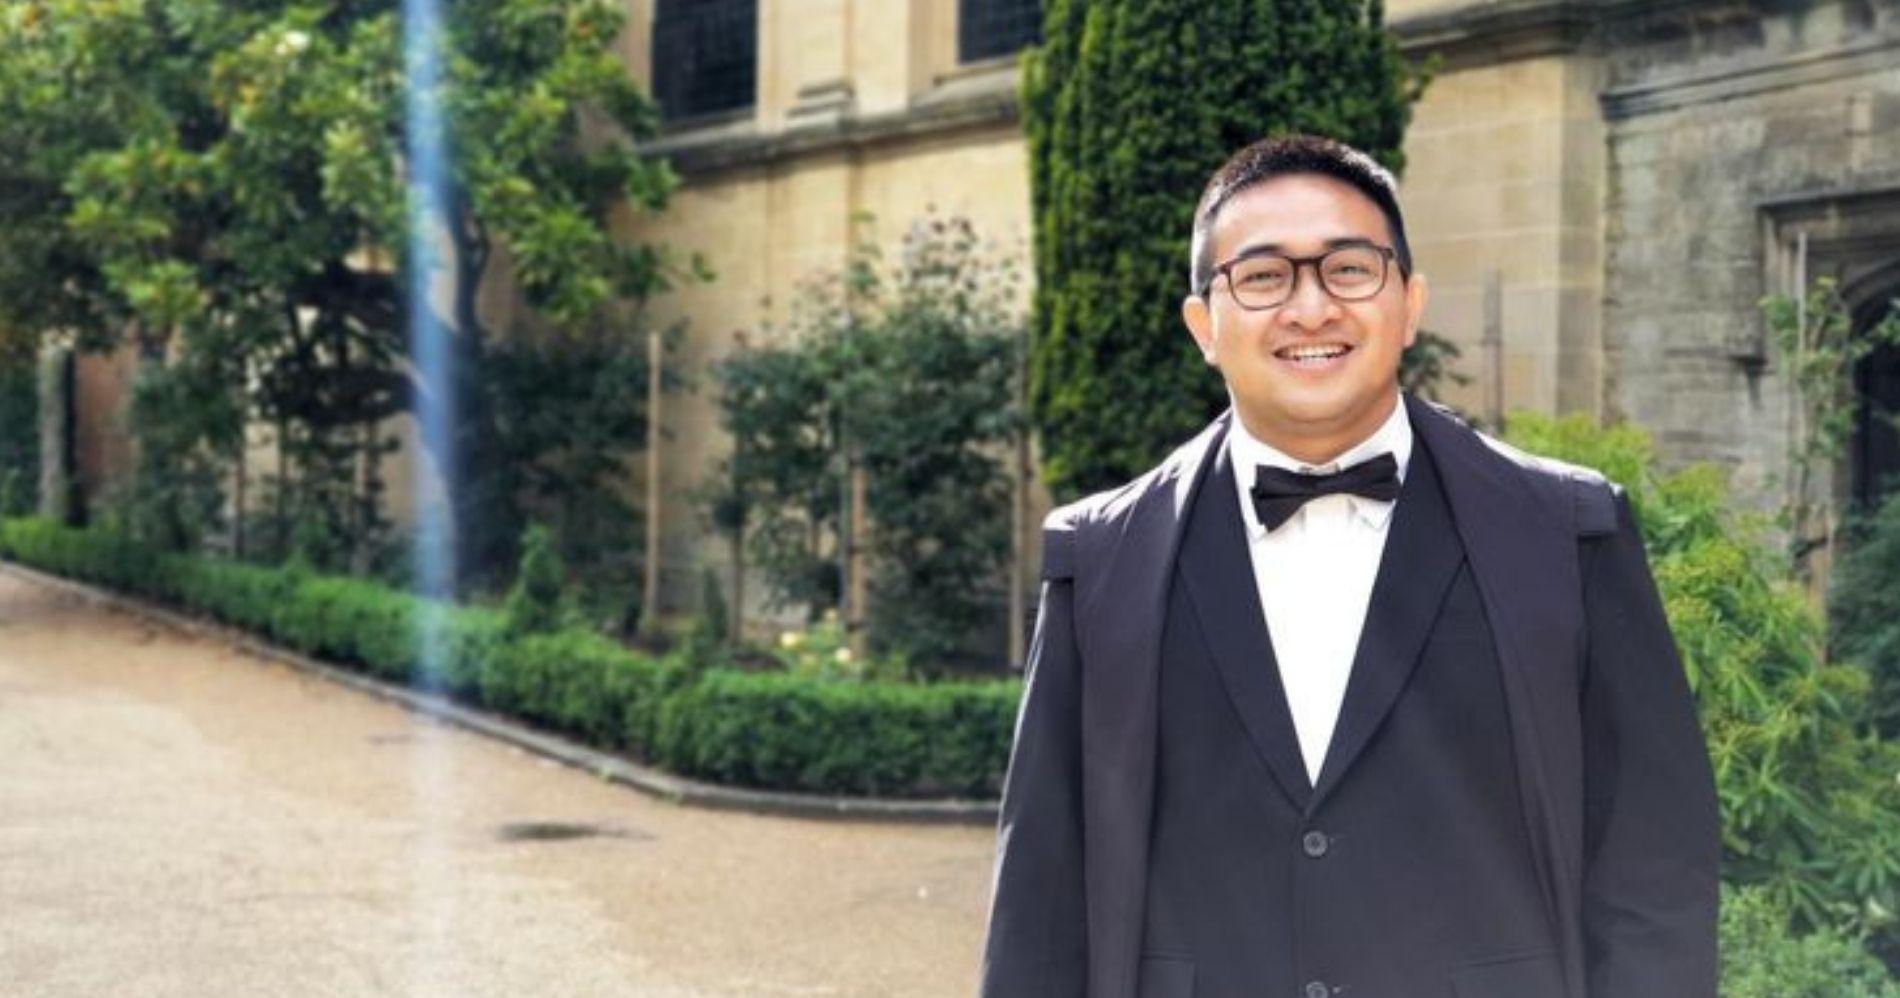 Indra Rudiansyah, WNI yang ikut serta dalam penelitian dan pembuatan Vaksin AstraZeneca. University Oxford, Inggris.